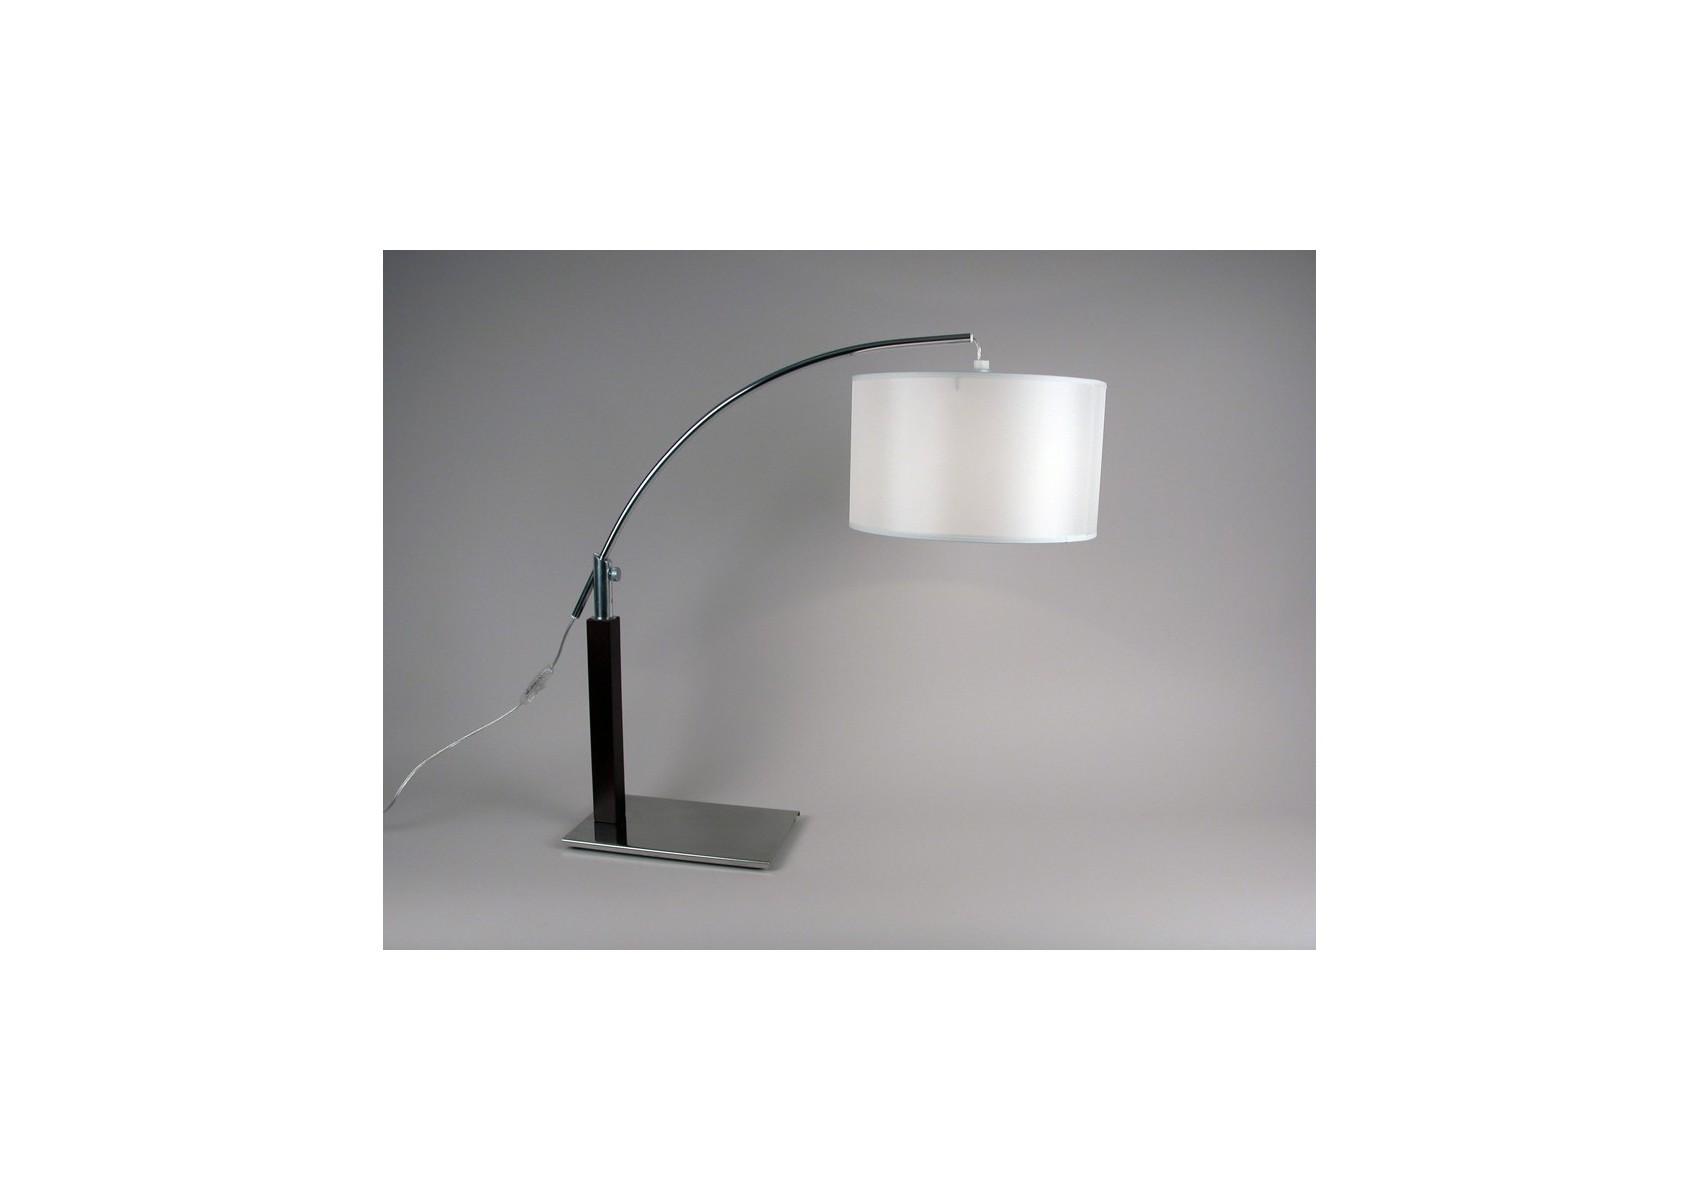 lampe poser arc rainbow boite design. Black Bedroom Furniture Sets. Home Design Ideas